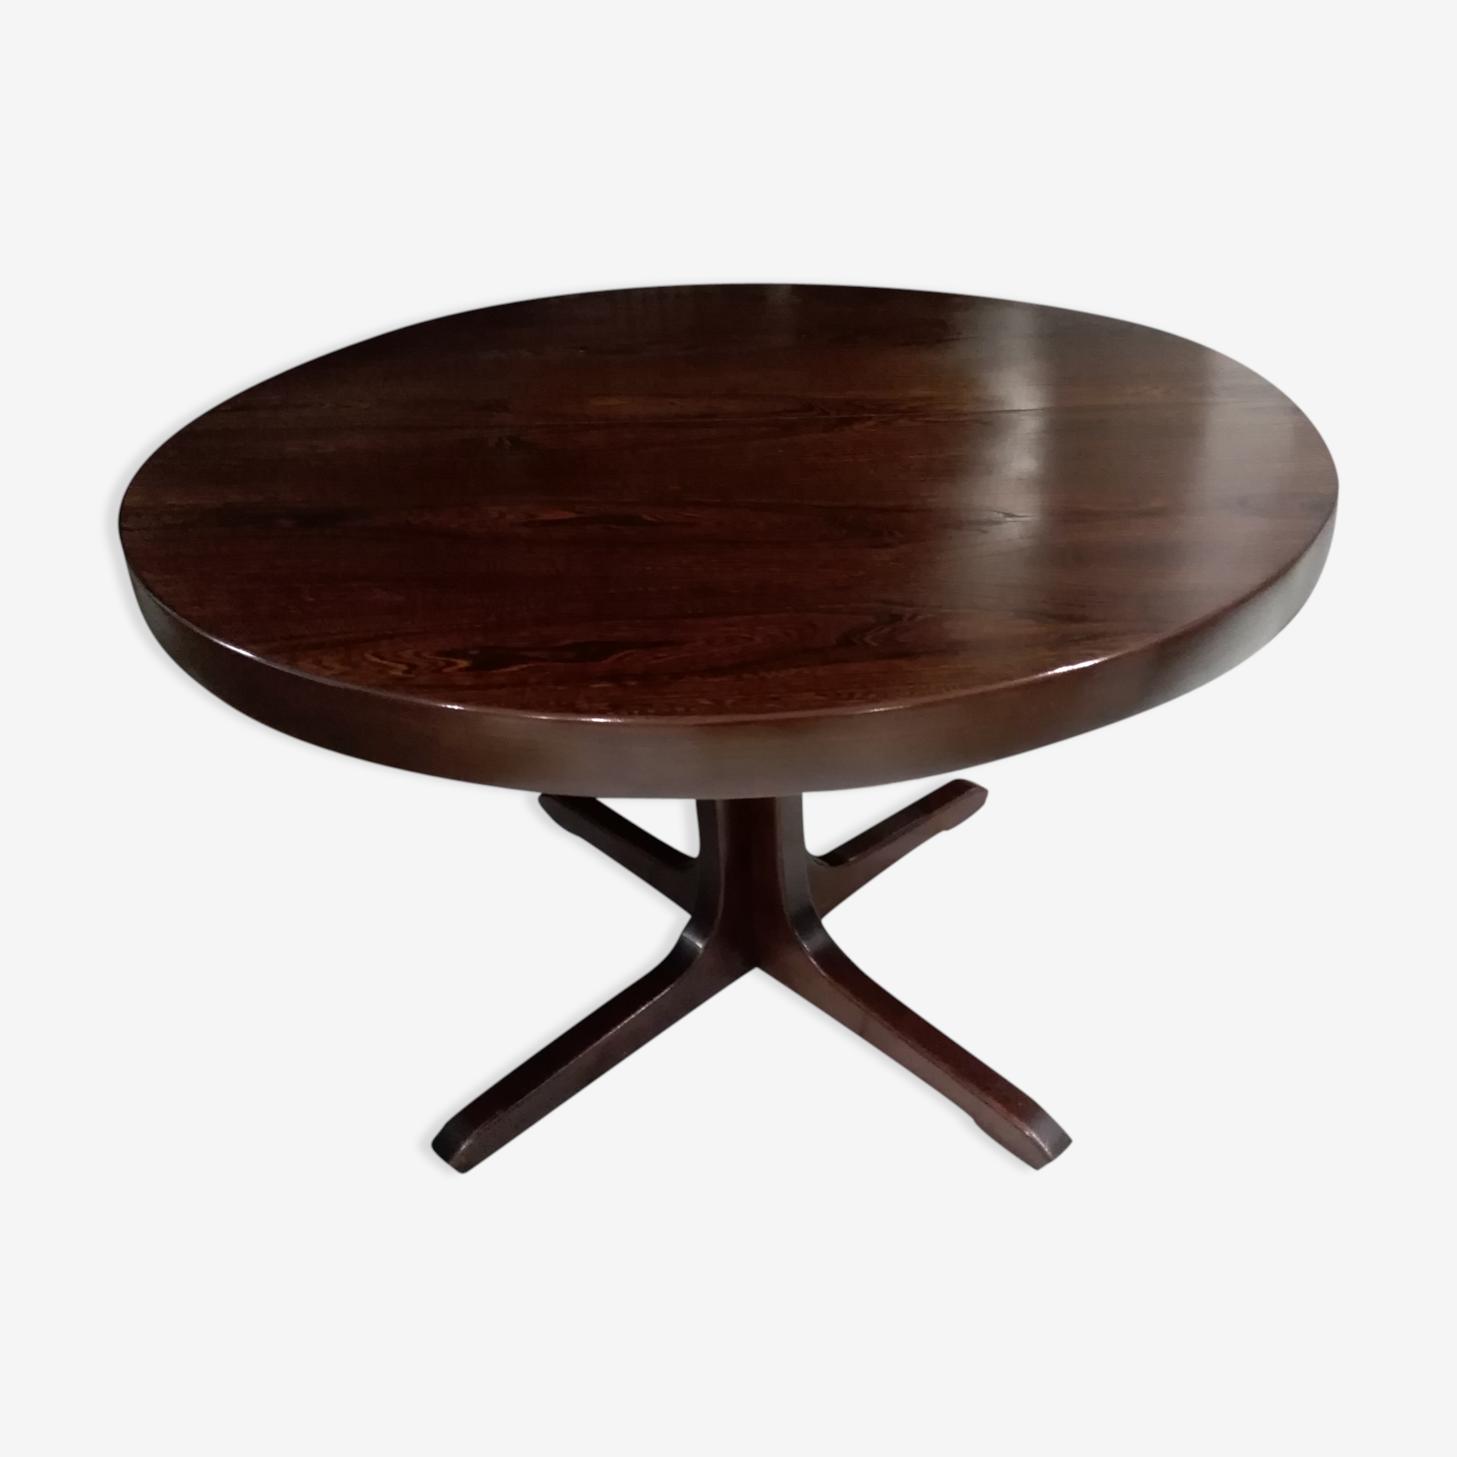 Round dining table extendable baumann 1970